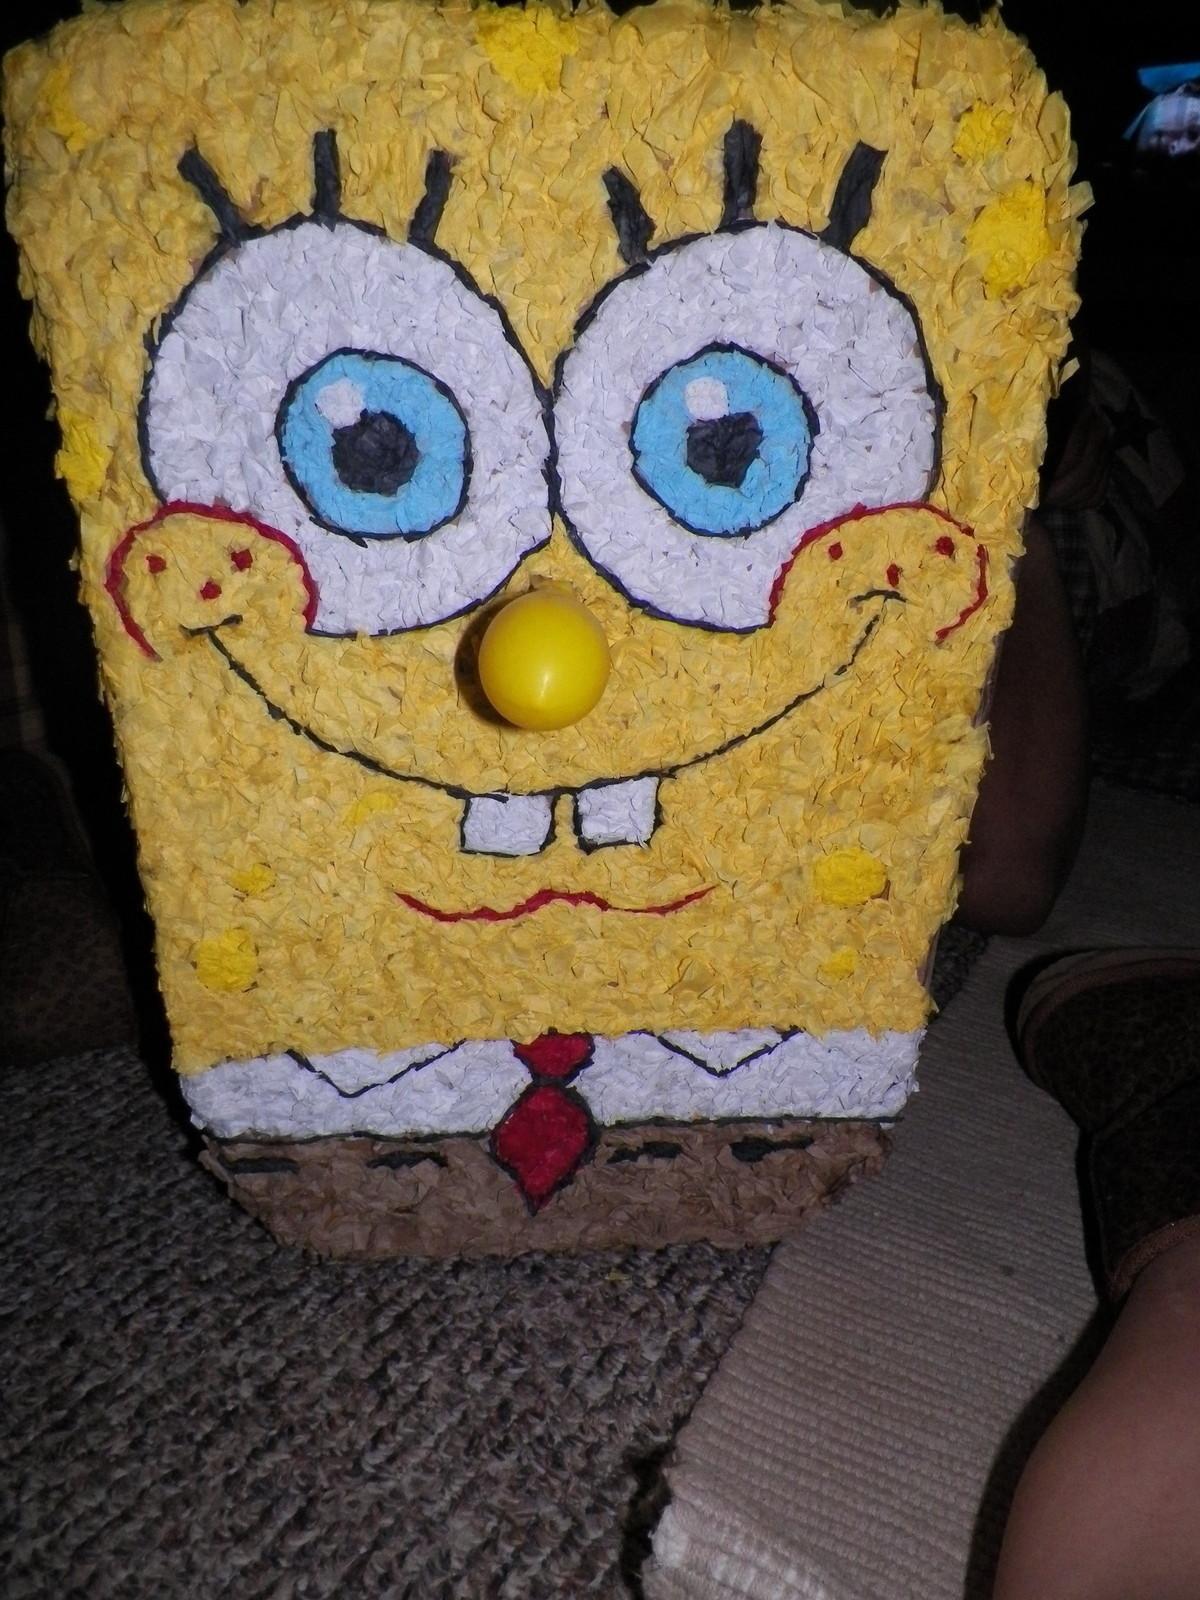 Spongebob Pinata A Piata Construction And Papercraft On Cut Out Keep